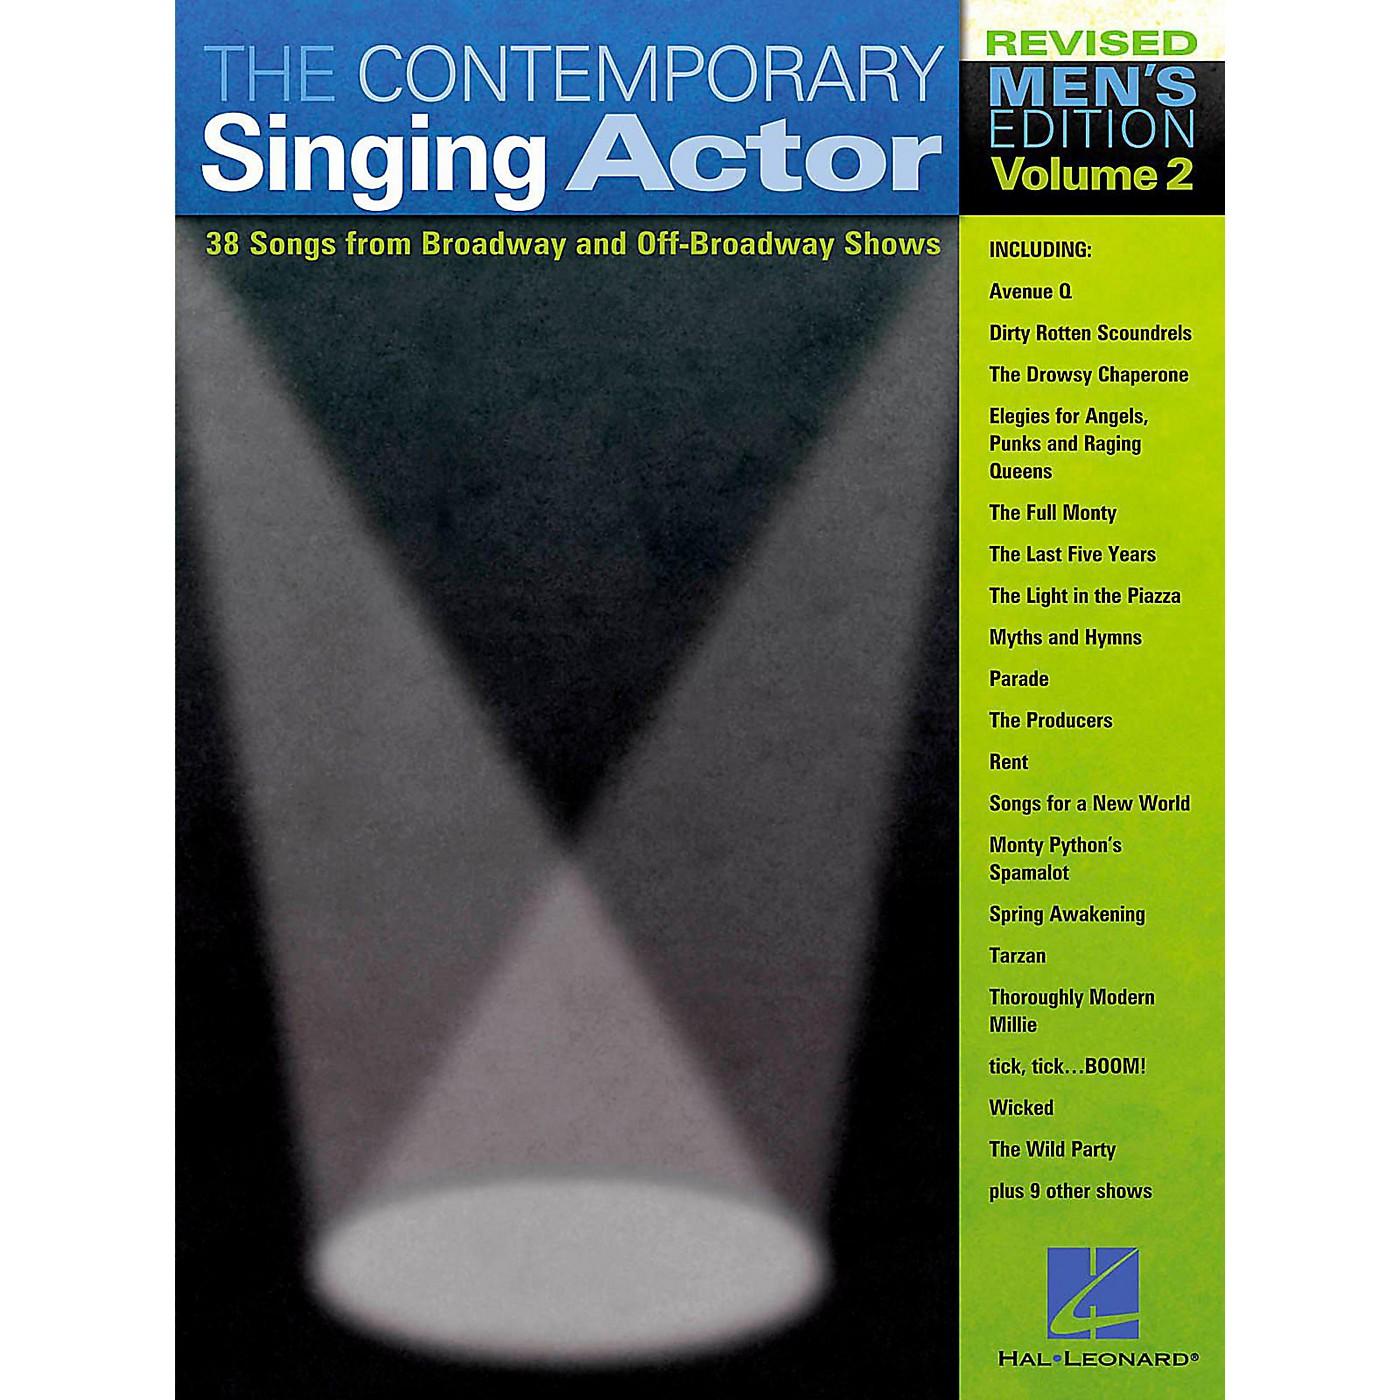 Hal Leonard The Contemporary Singing Actor - Men's Edition Volume 2 thumbnail